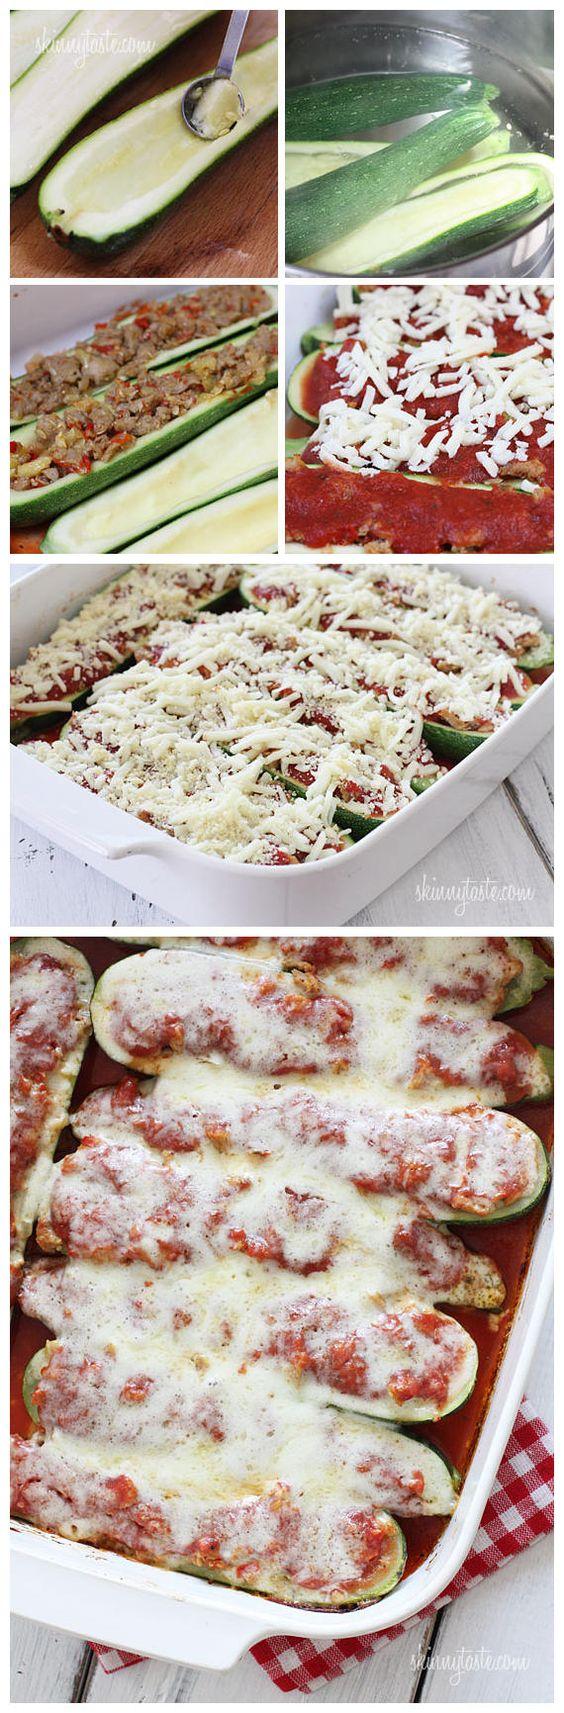 cookglee recipe pictures: Sausage Stuffed Zucchini Boats ...